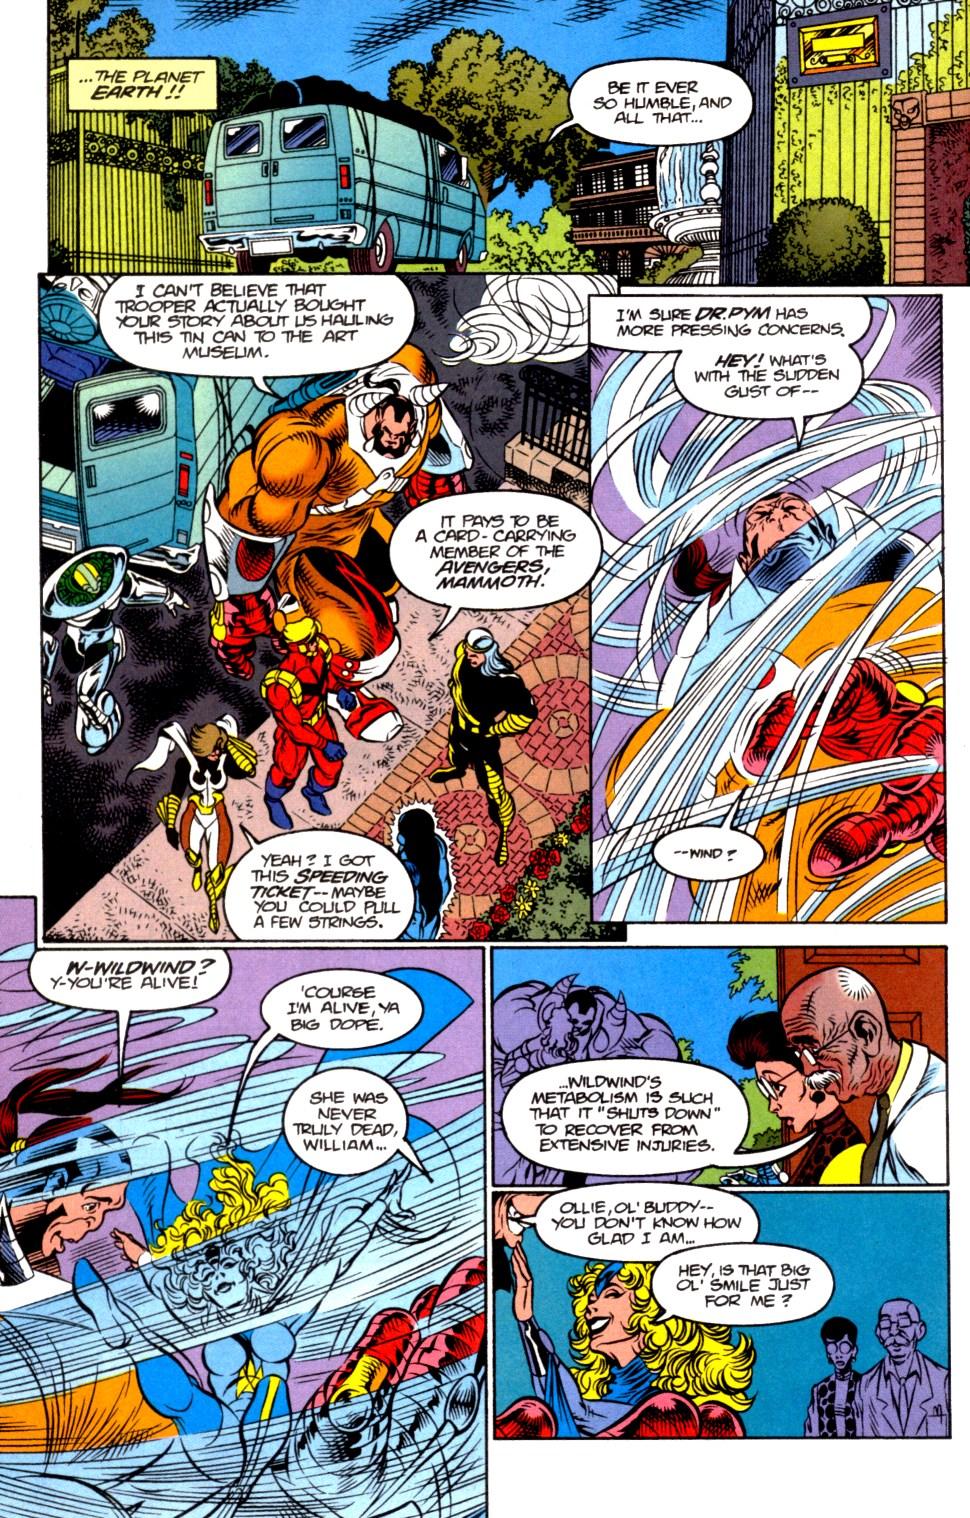 Read online Blackwulf comic -  Issue #6 - 4